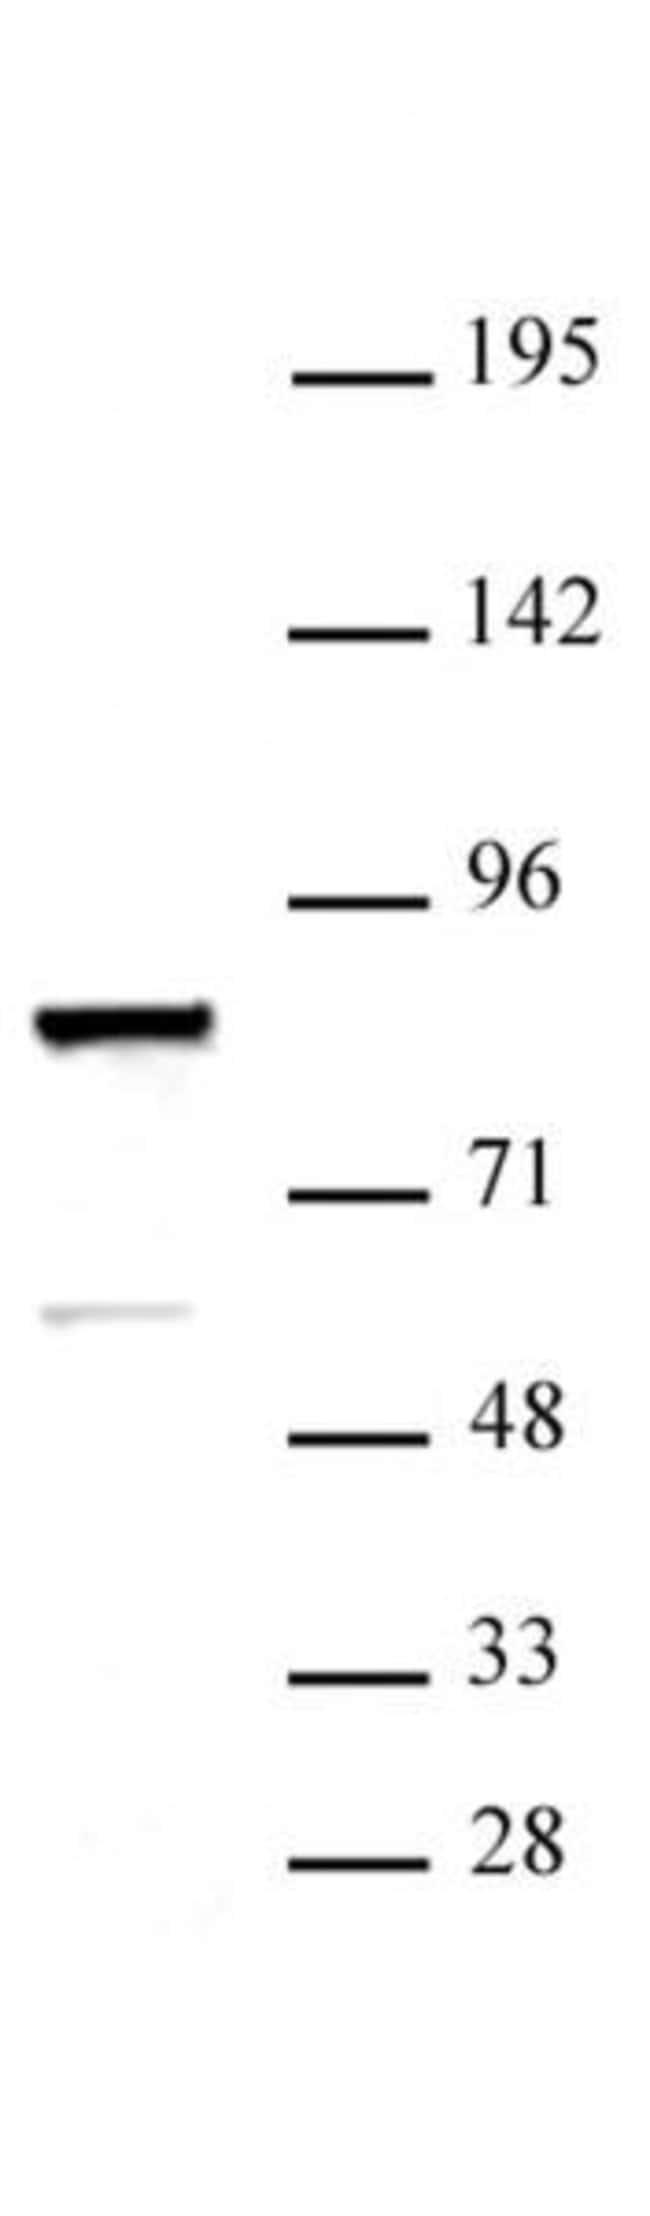 ARID3A Rabbit anti-Human, Unconjugated, Polyclonal, Active Motif:Antibodies:Primary